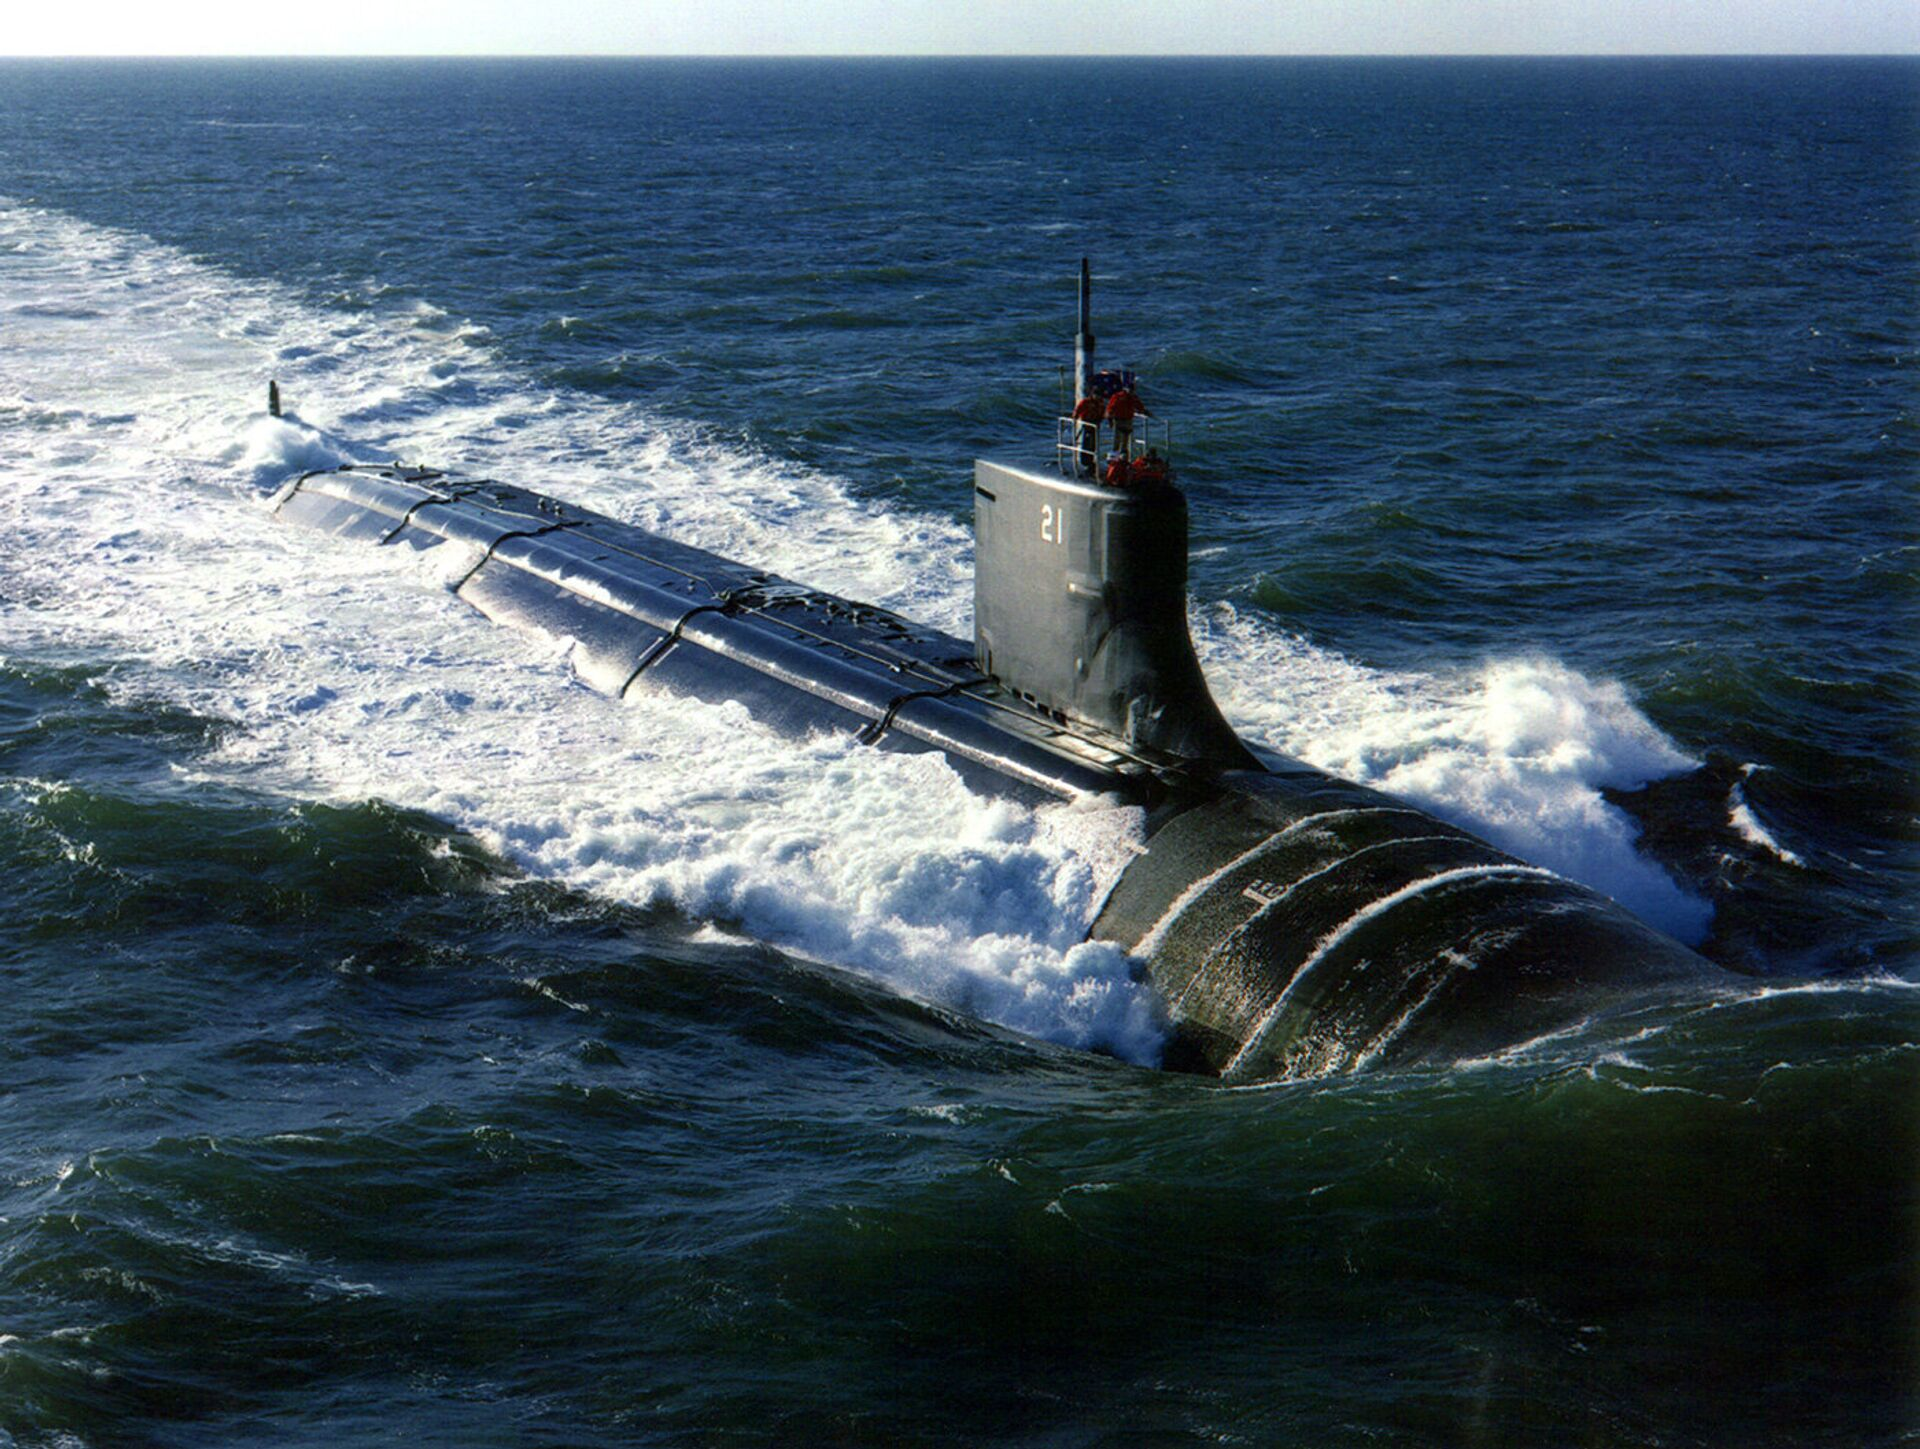 Подводная лодка типа Seawolf - РИА Новости, 1920, 20.10.2020